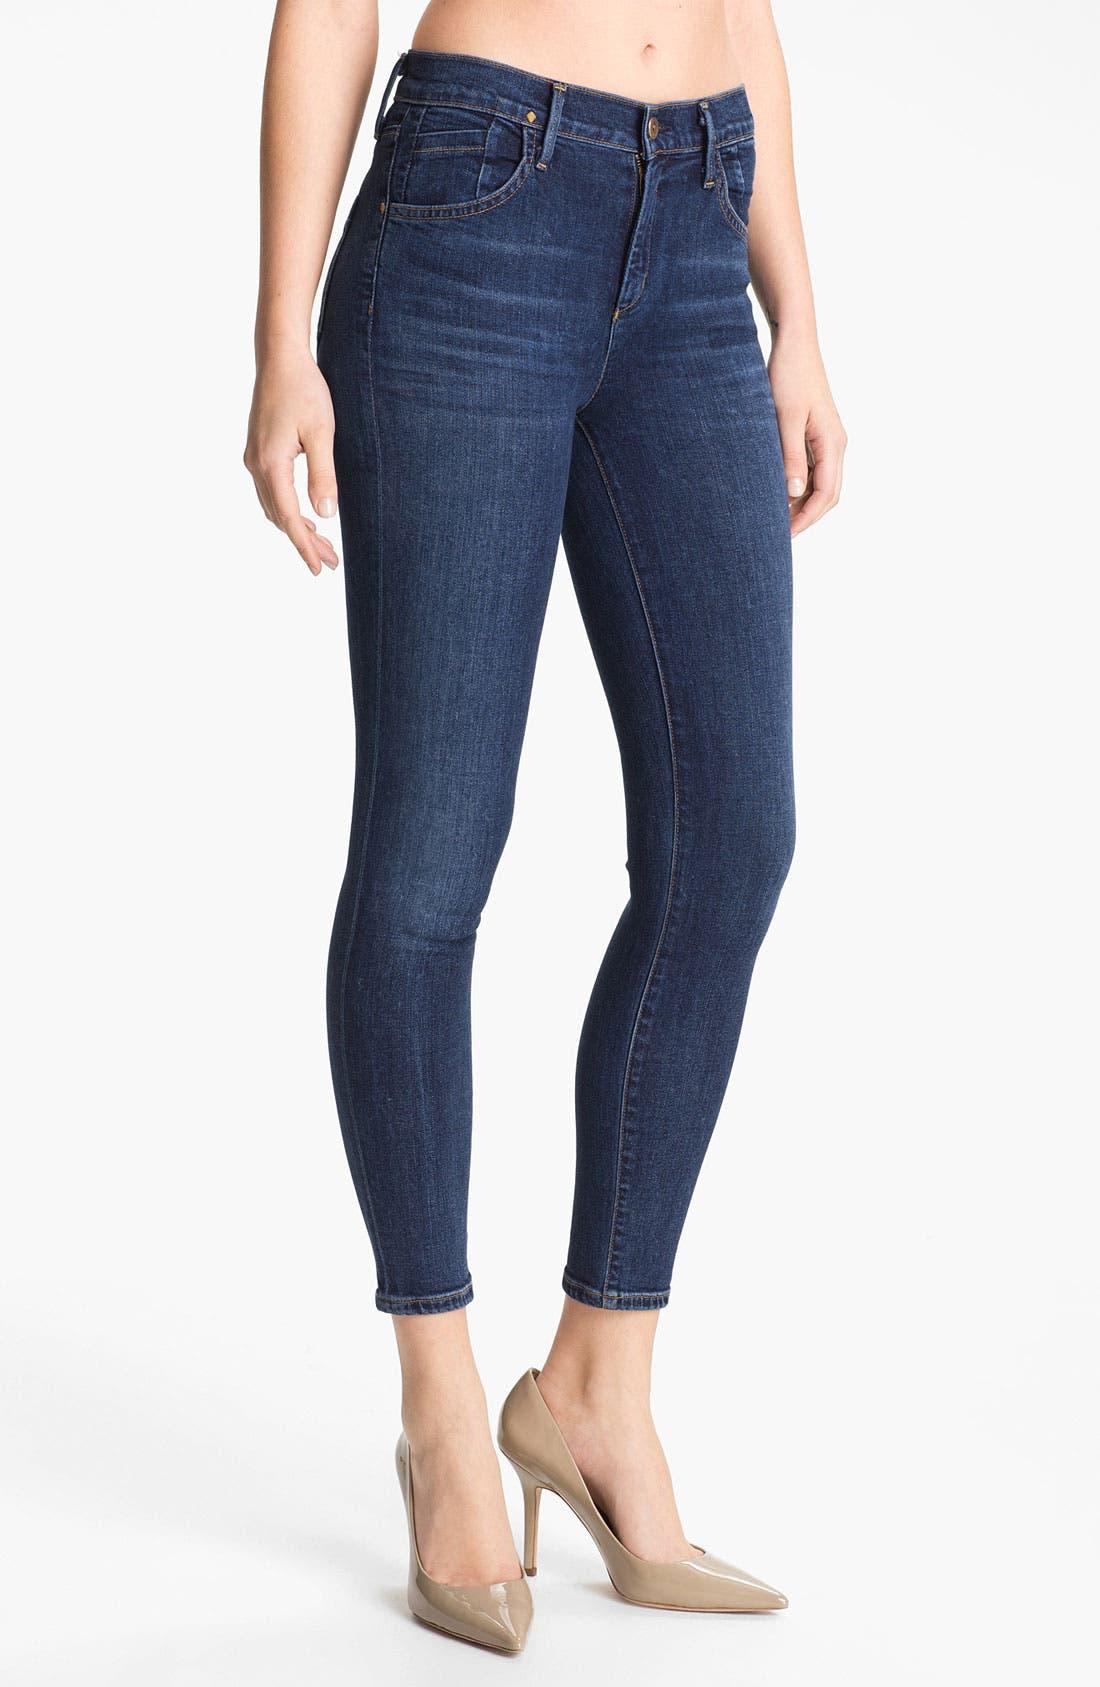 Alternate Image 1 Selected - Goldsign 'Virtual' Crop Skinny Stretch Jeans (Zagir)